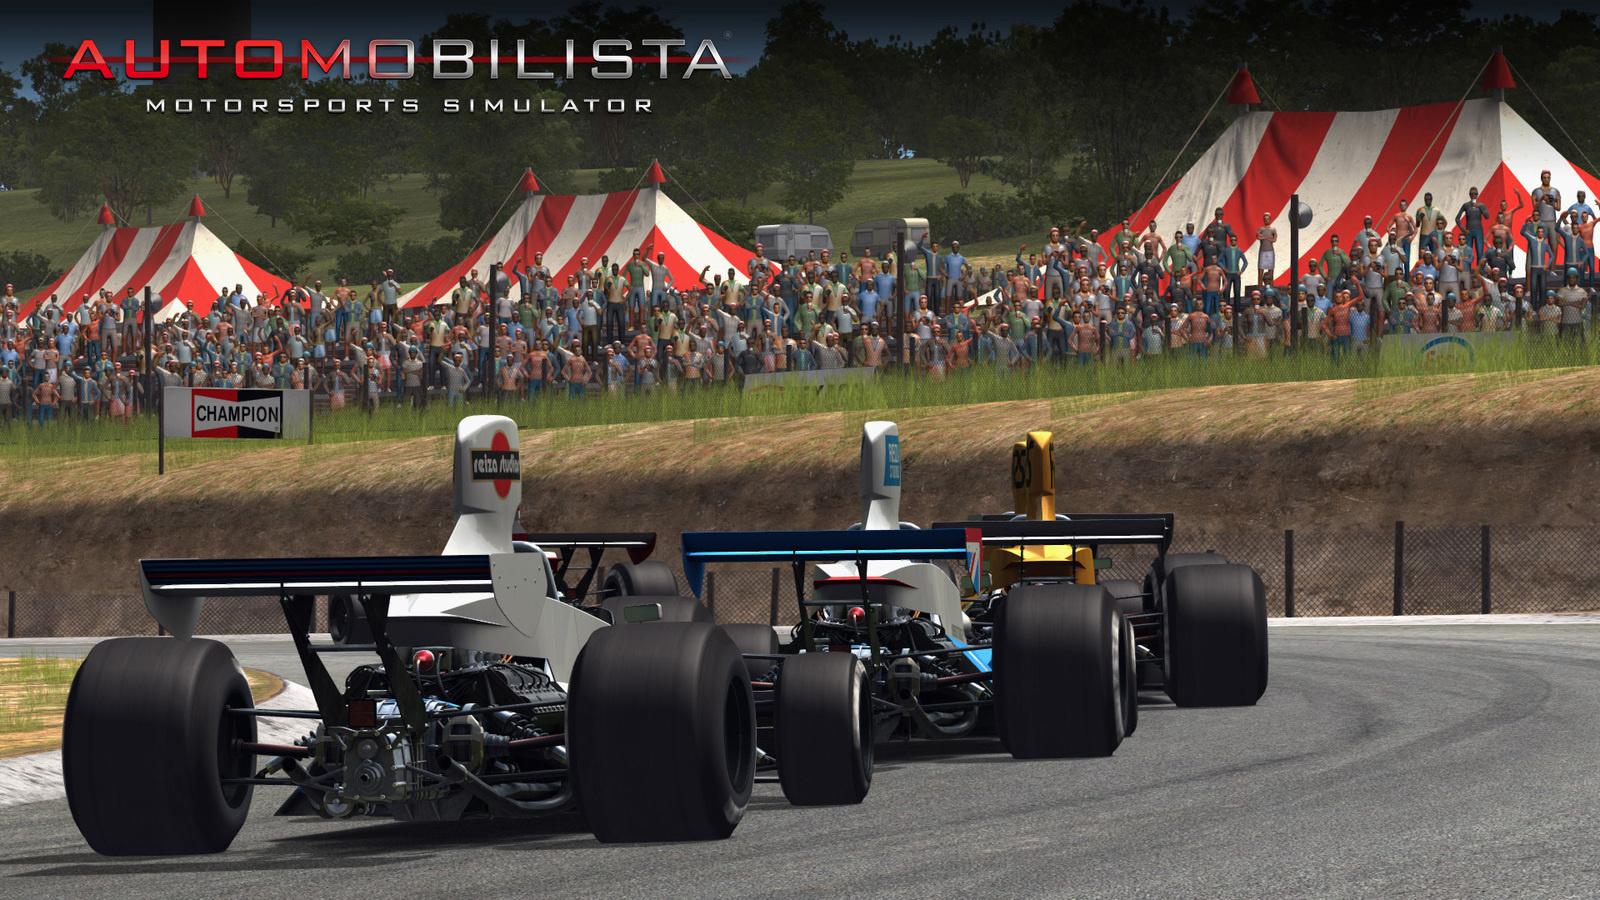 Automobilista new build.jpg